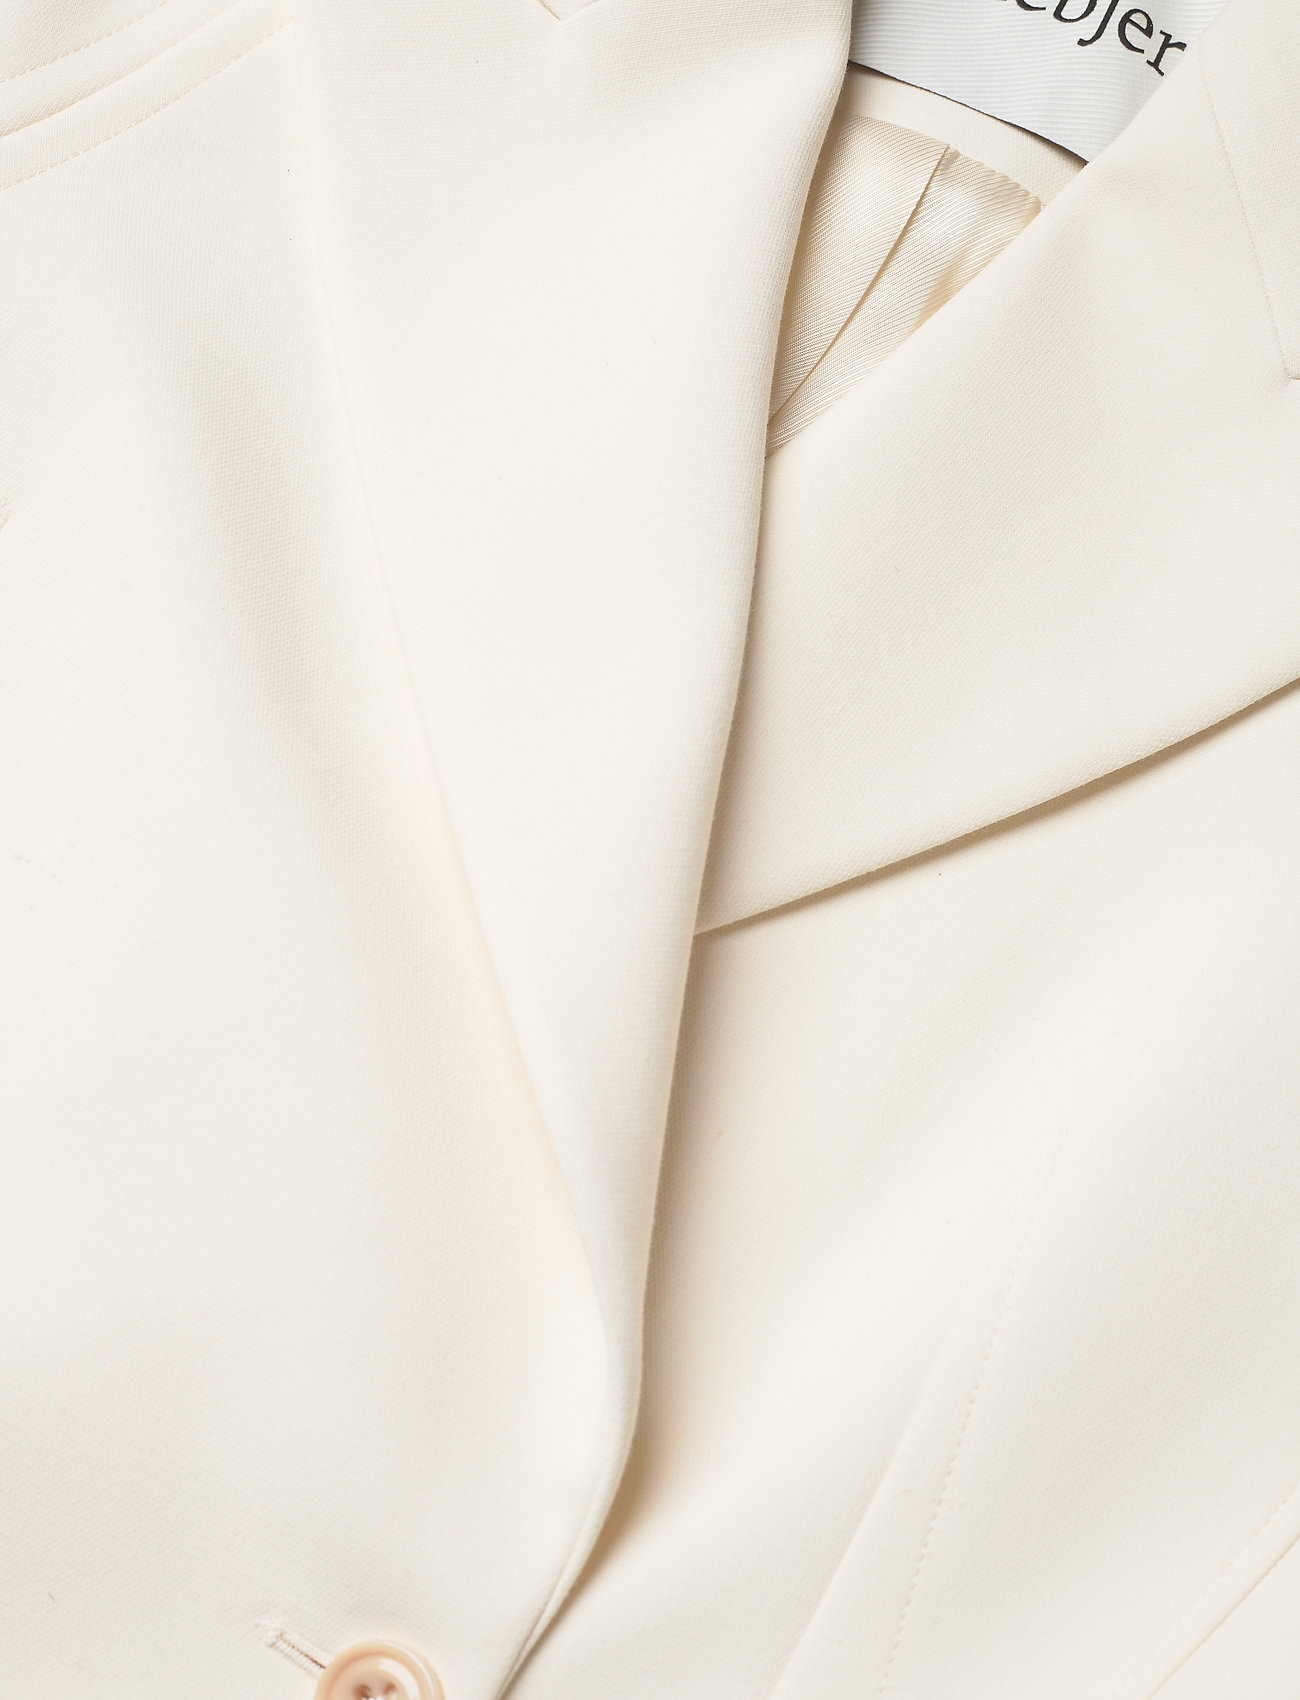 RODEBJER - RODEBJER DUSA - leichte mäntel - ceramic white - 2